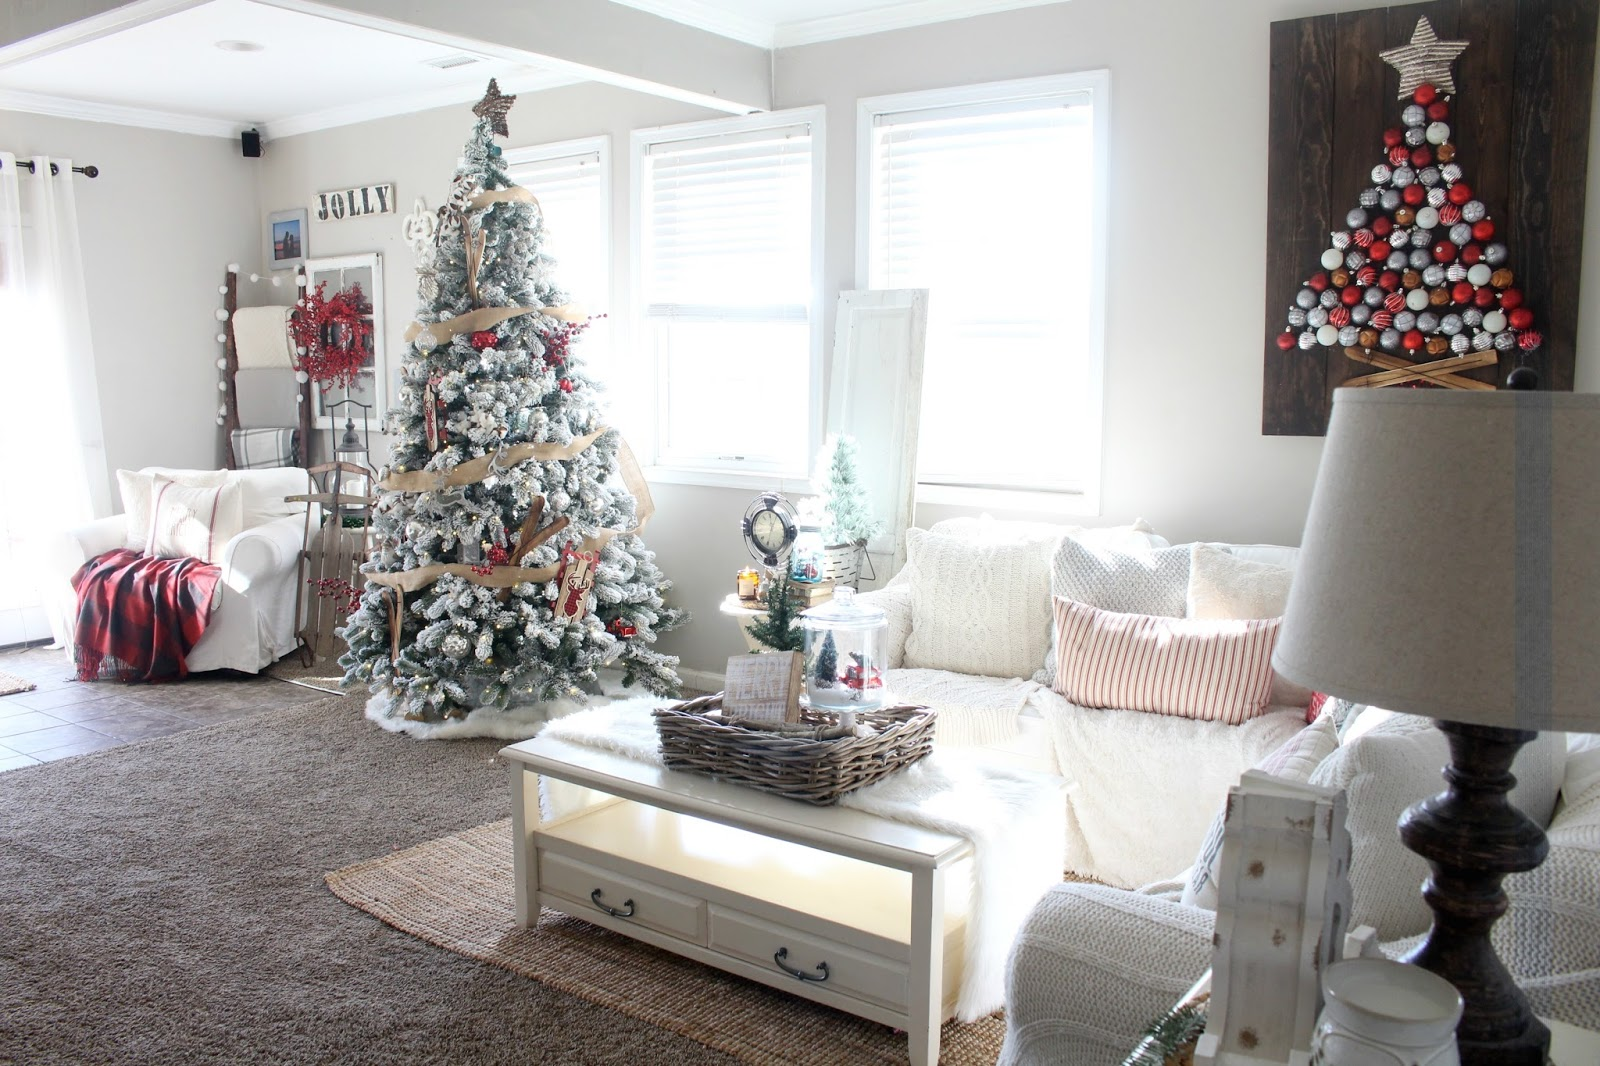 Rustic Glam Christmas Living Room Tour - The Glam Farmhouse